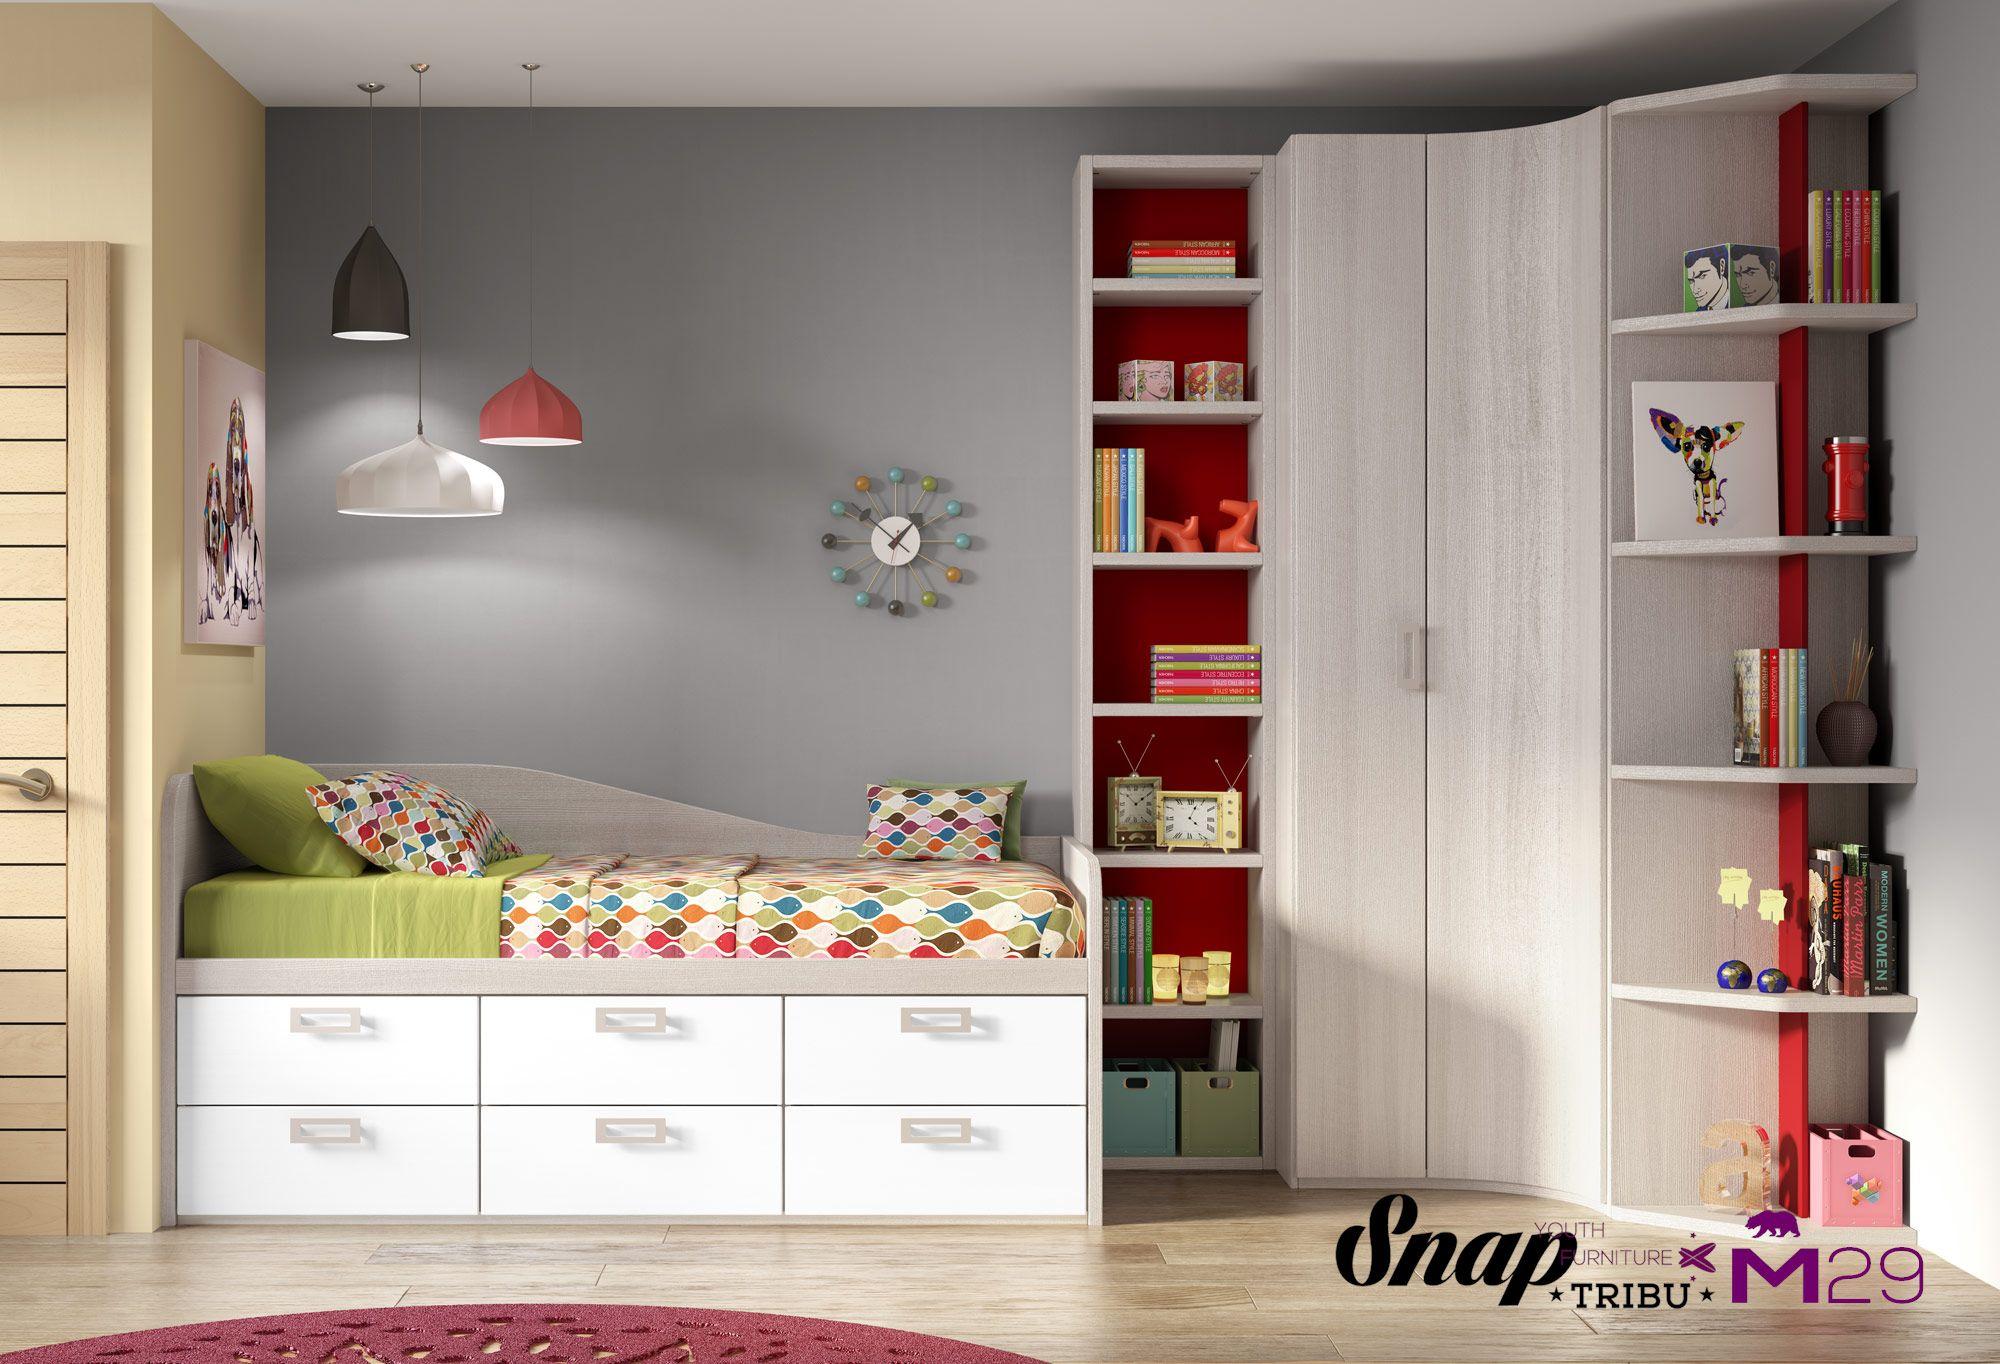 Tribu snap muebles hermida mueble juvenil m29 for Muebles juveniles zona norte